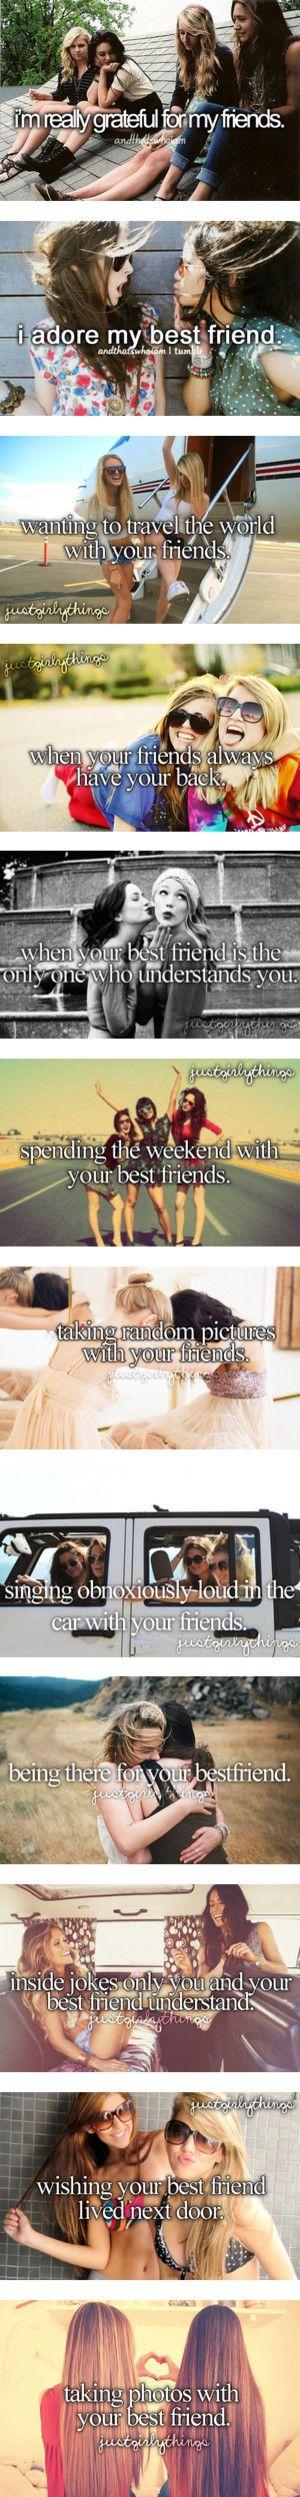 I love my friends! I mostly do all of these things.. lol <3 @Aylin Avila Juarez @Thania Hermosillo @Sesthleng Garcia   @Josselyne Jurado @Aubrianna Campbell